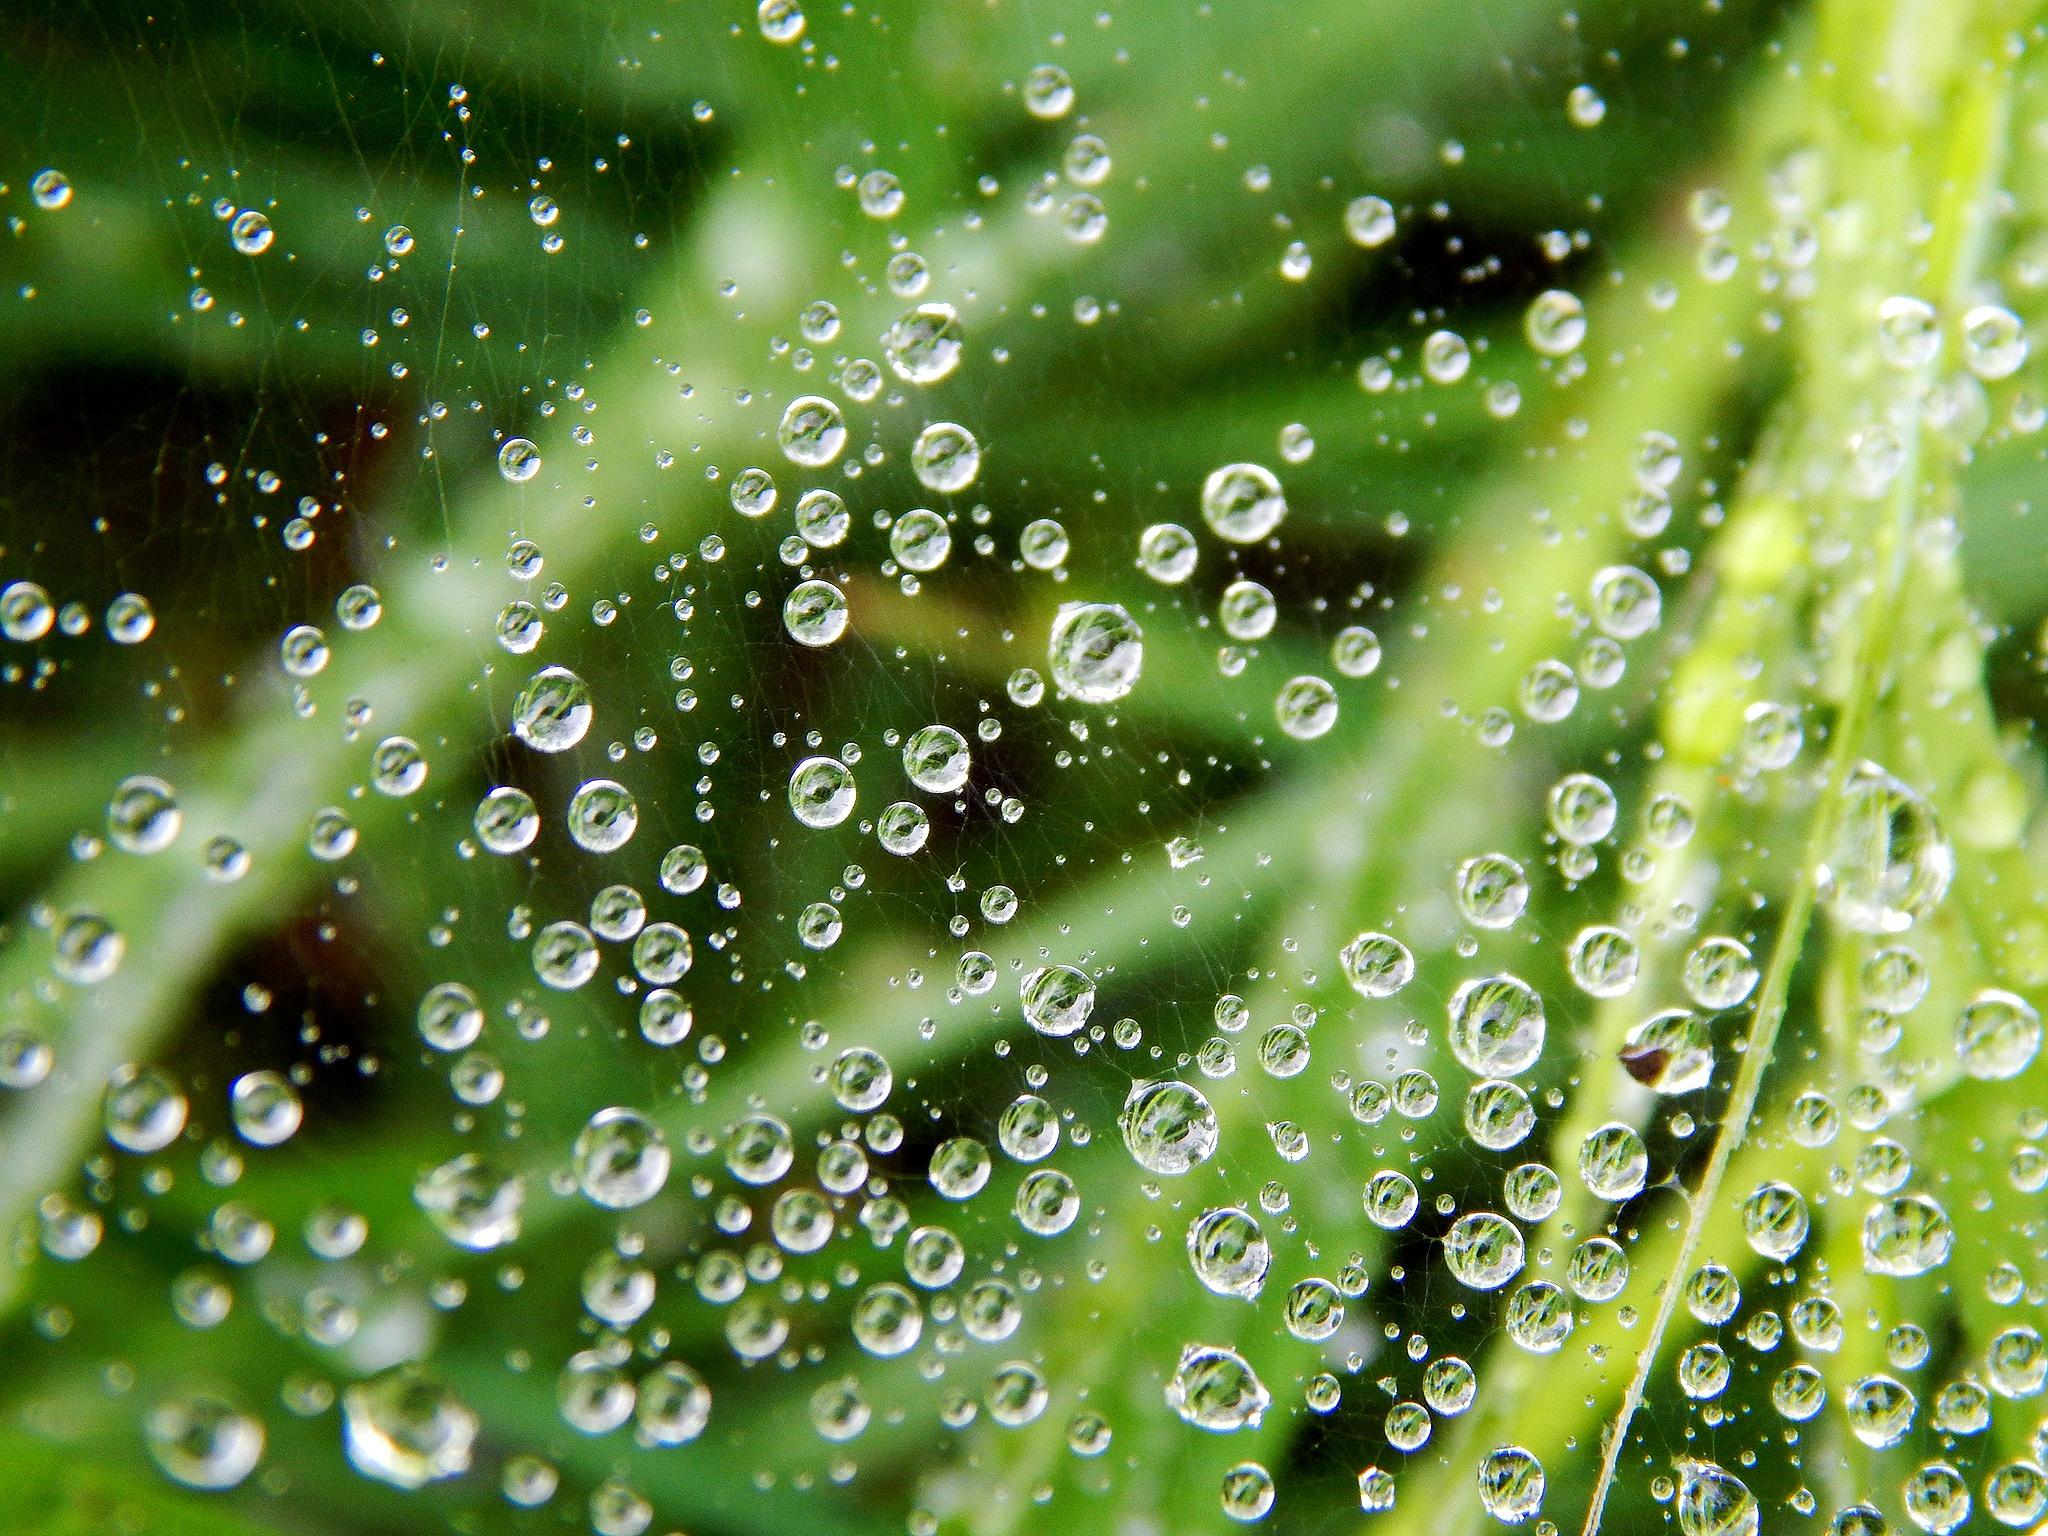 Dewdrop and spider web by Nikolett Rostási